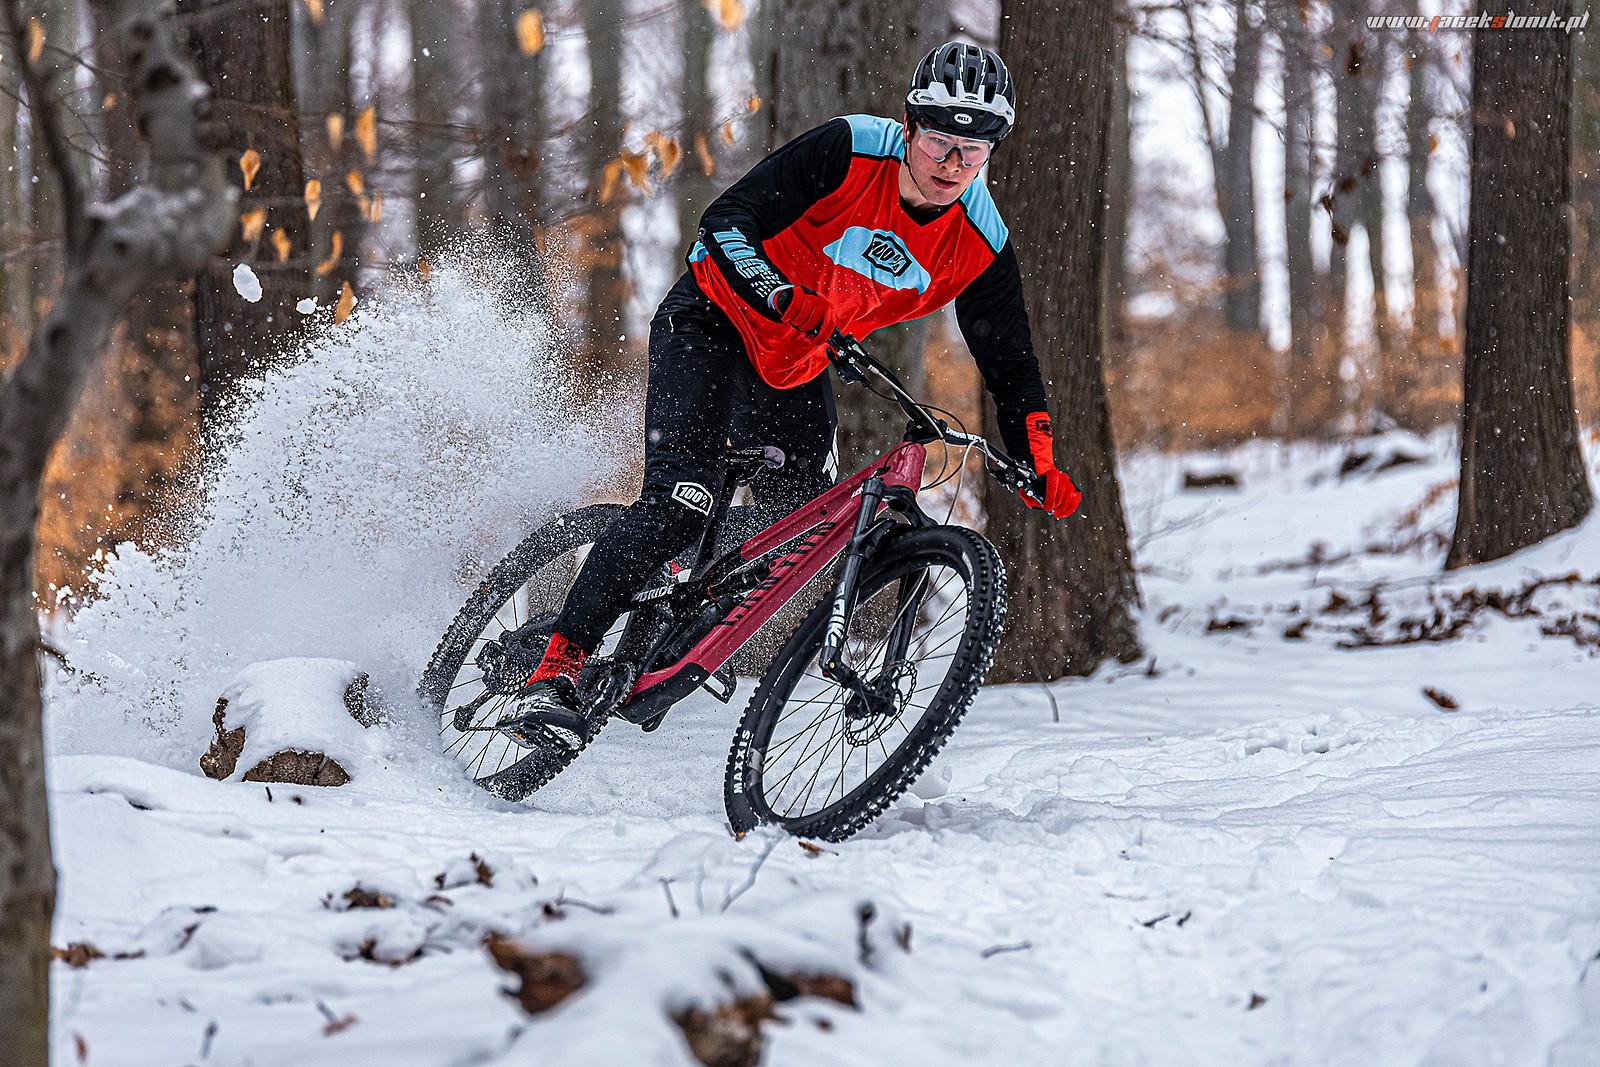 Riding on a snow ... - JacekSlonik - Mountain Biking Pictures - Vital MTB